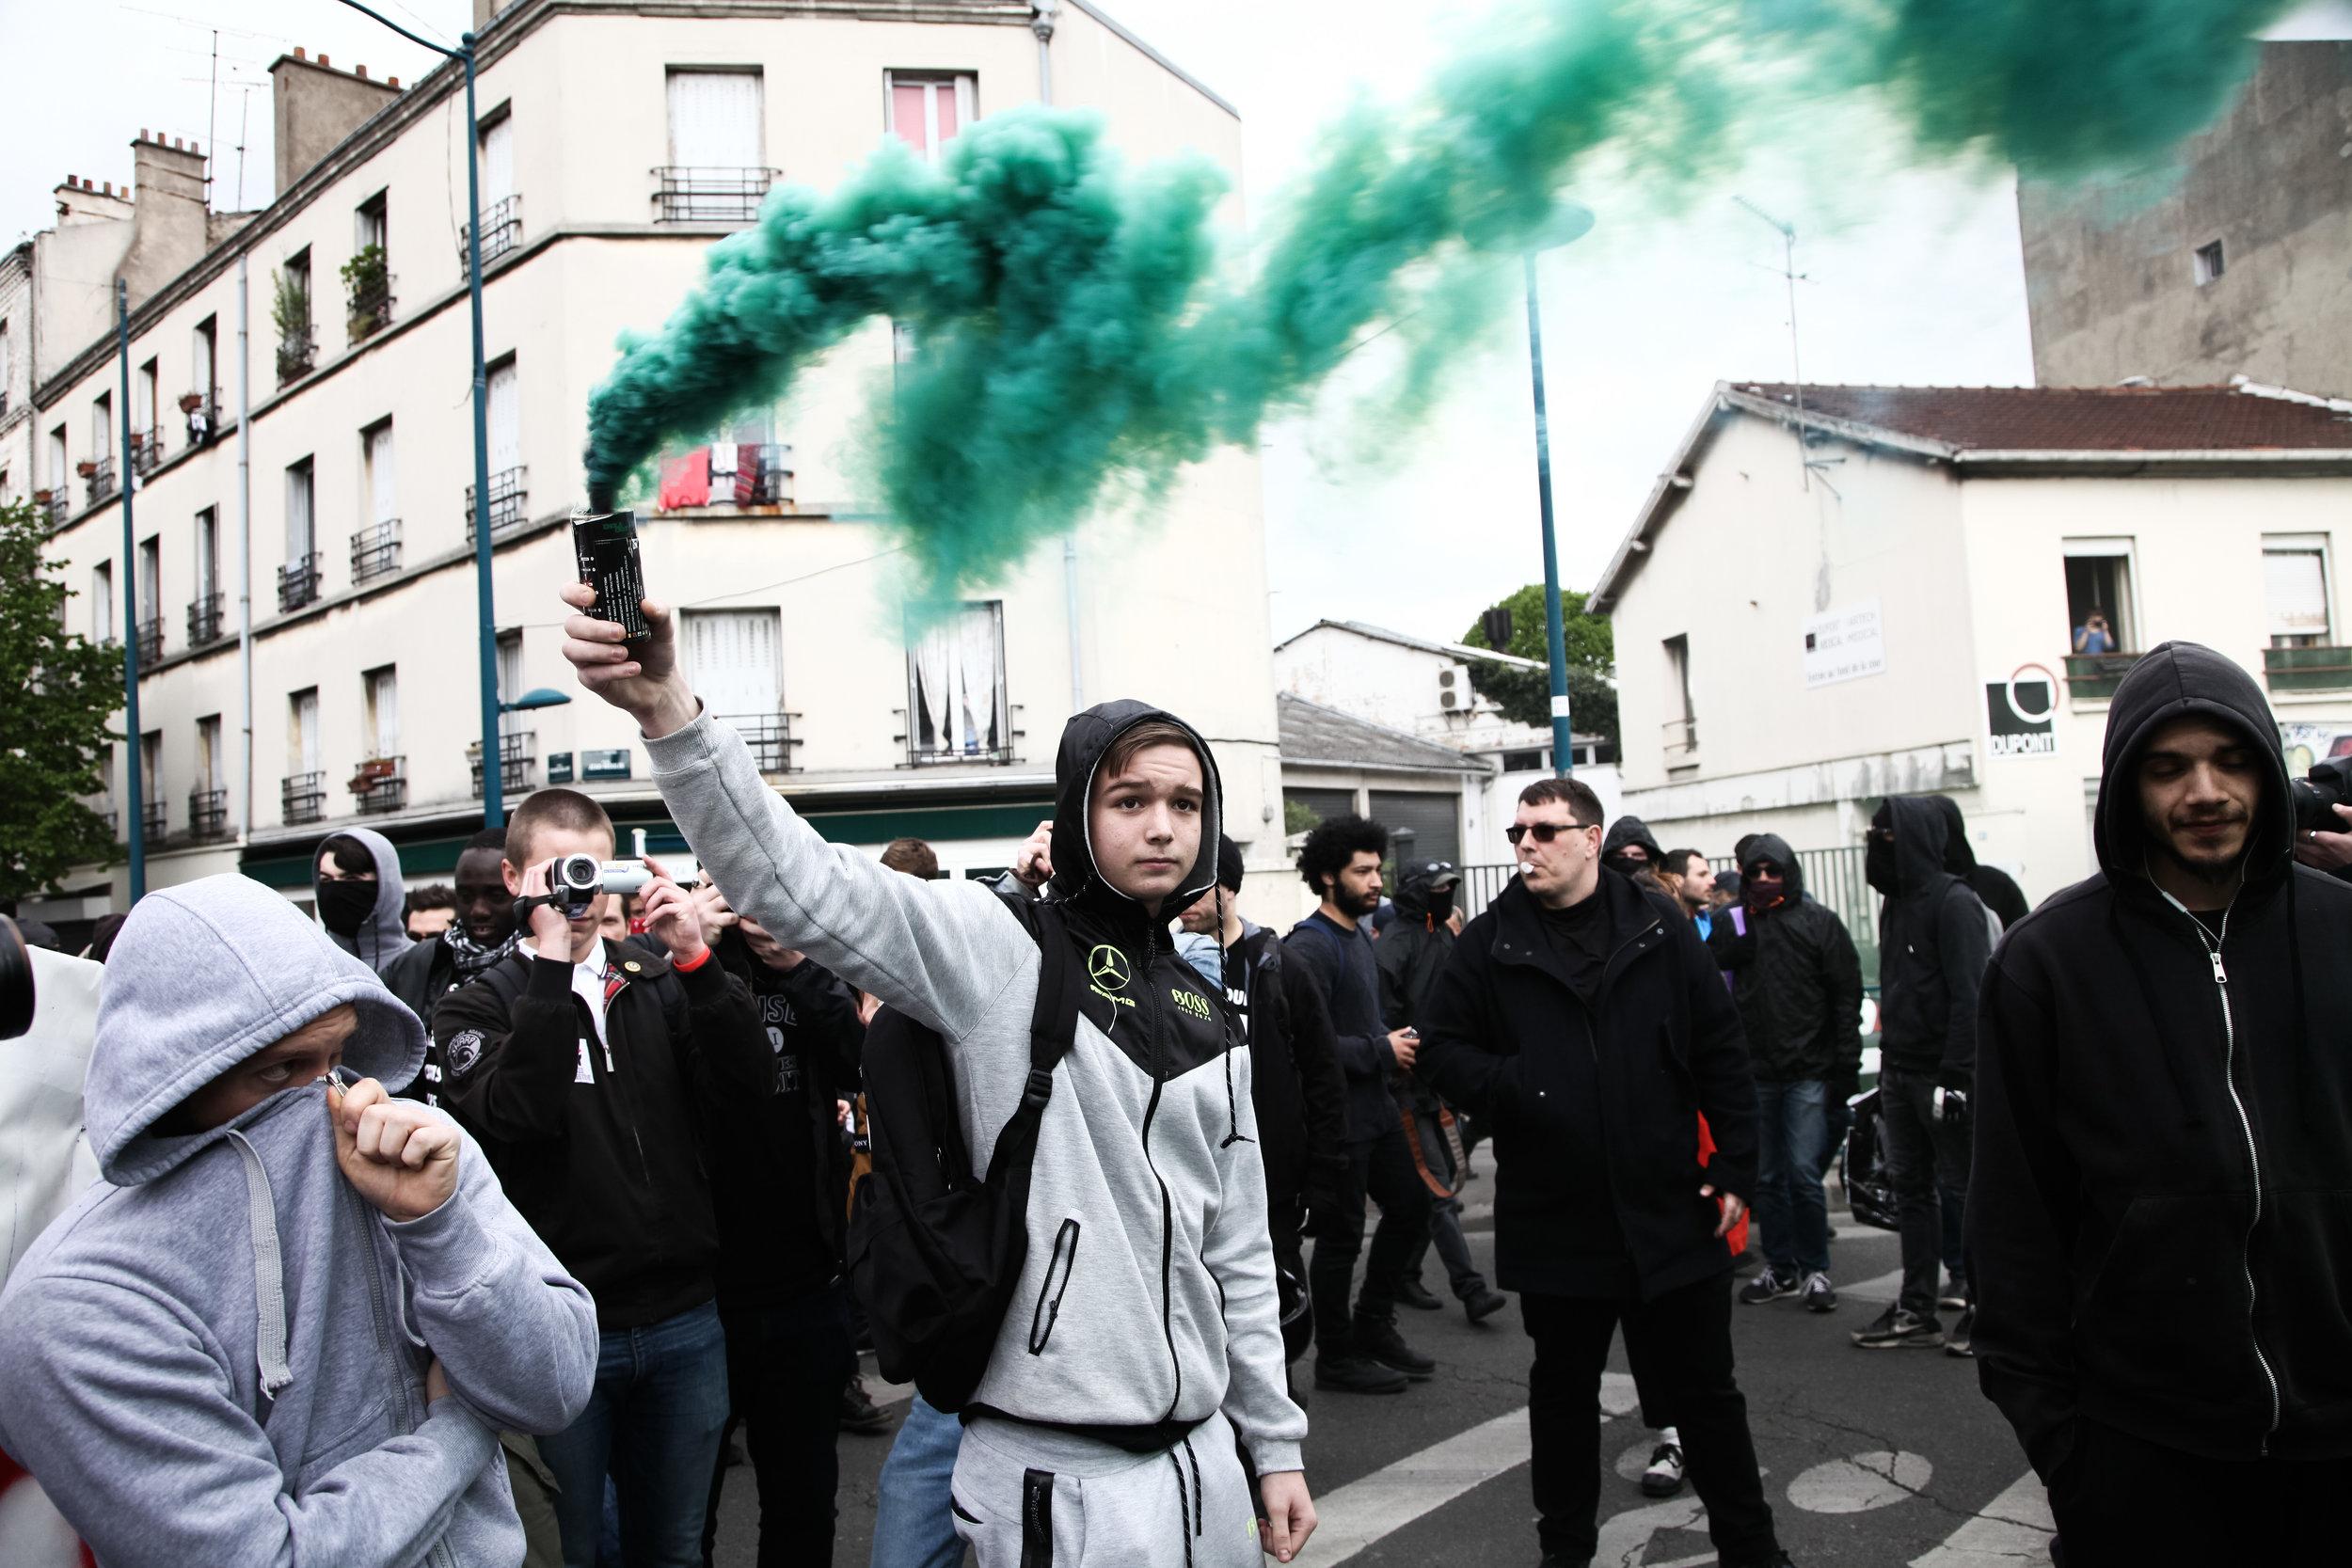 23-20170416-MANIFESTATION-ANTIFA-PARIS©Augustin-Le_Gall-Haytham-Pictures-IMG_0808.jpg